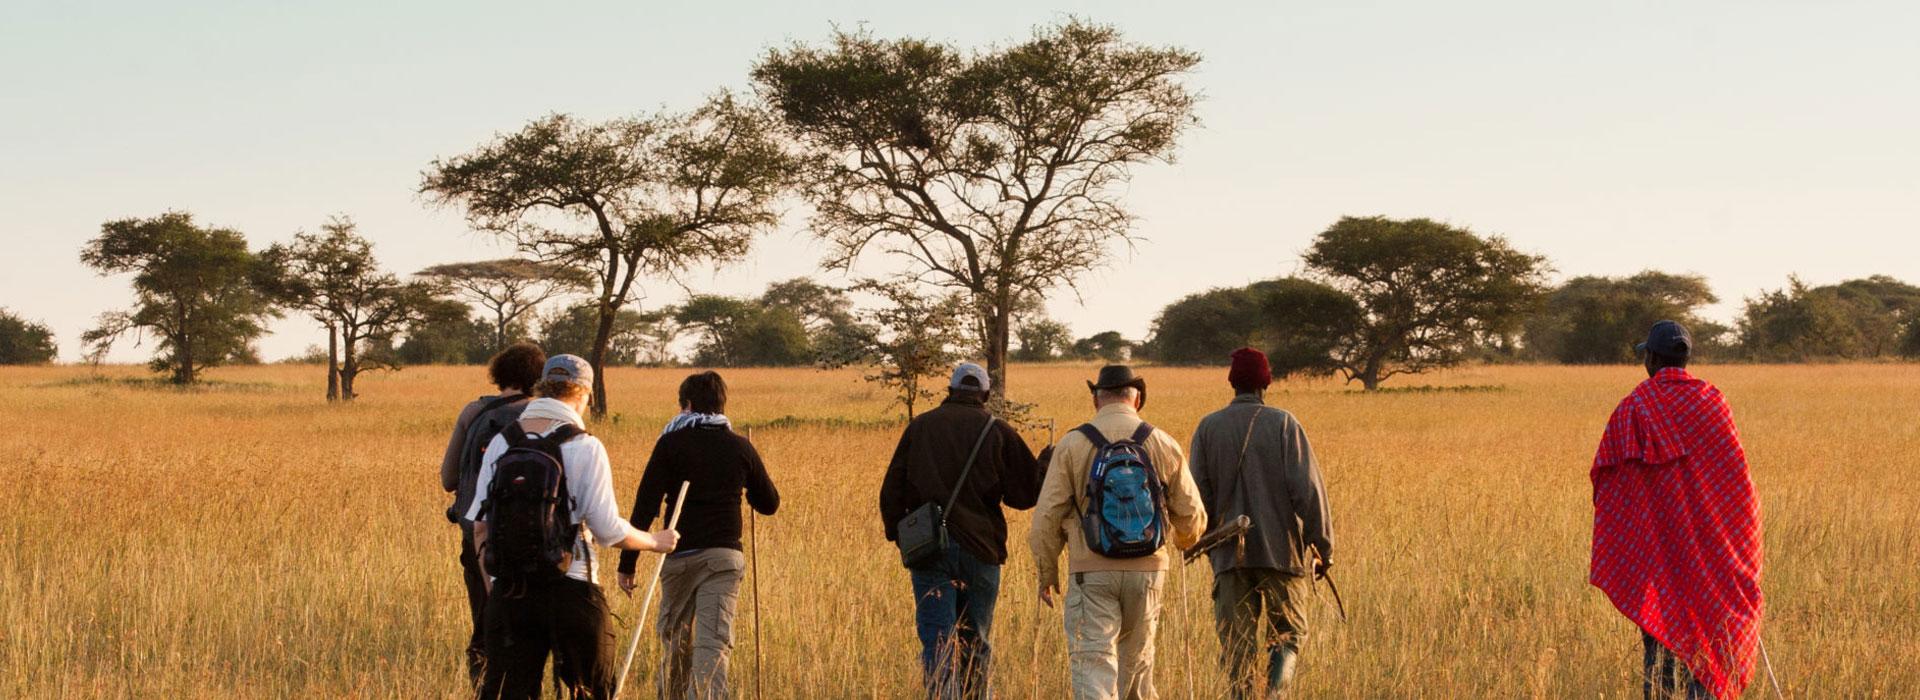 10 Days Magical Kenya and Tanzania Safari